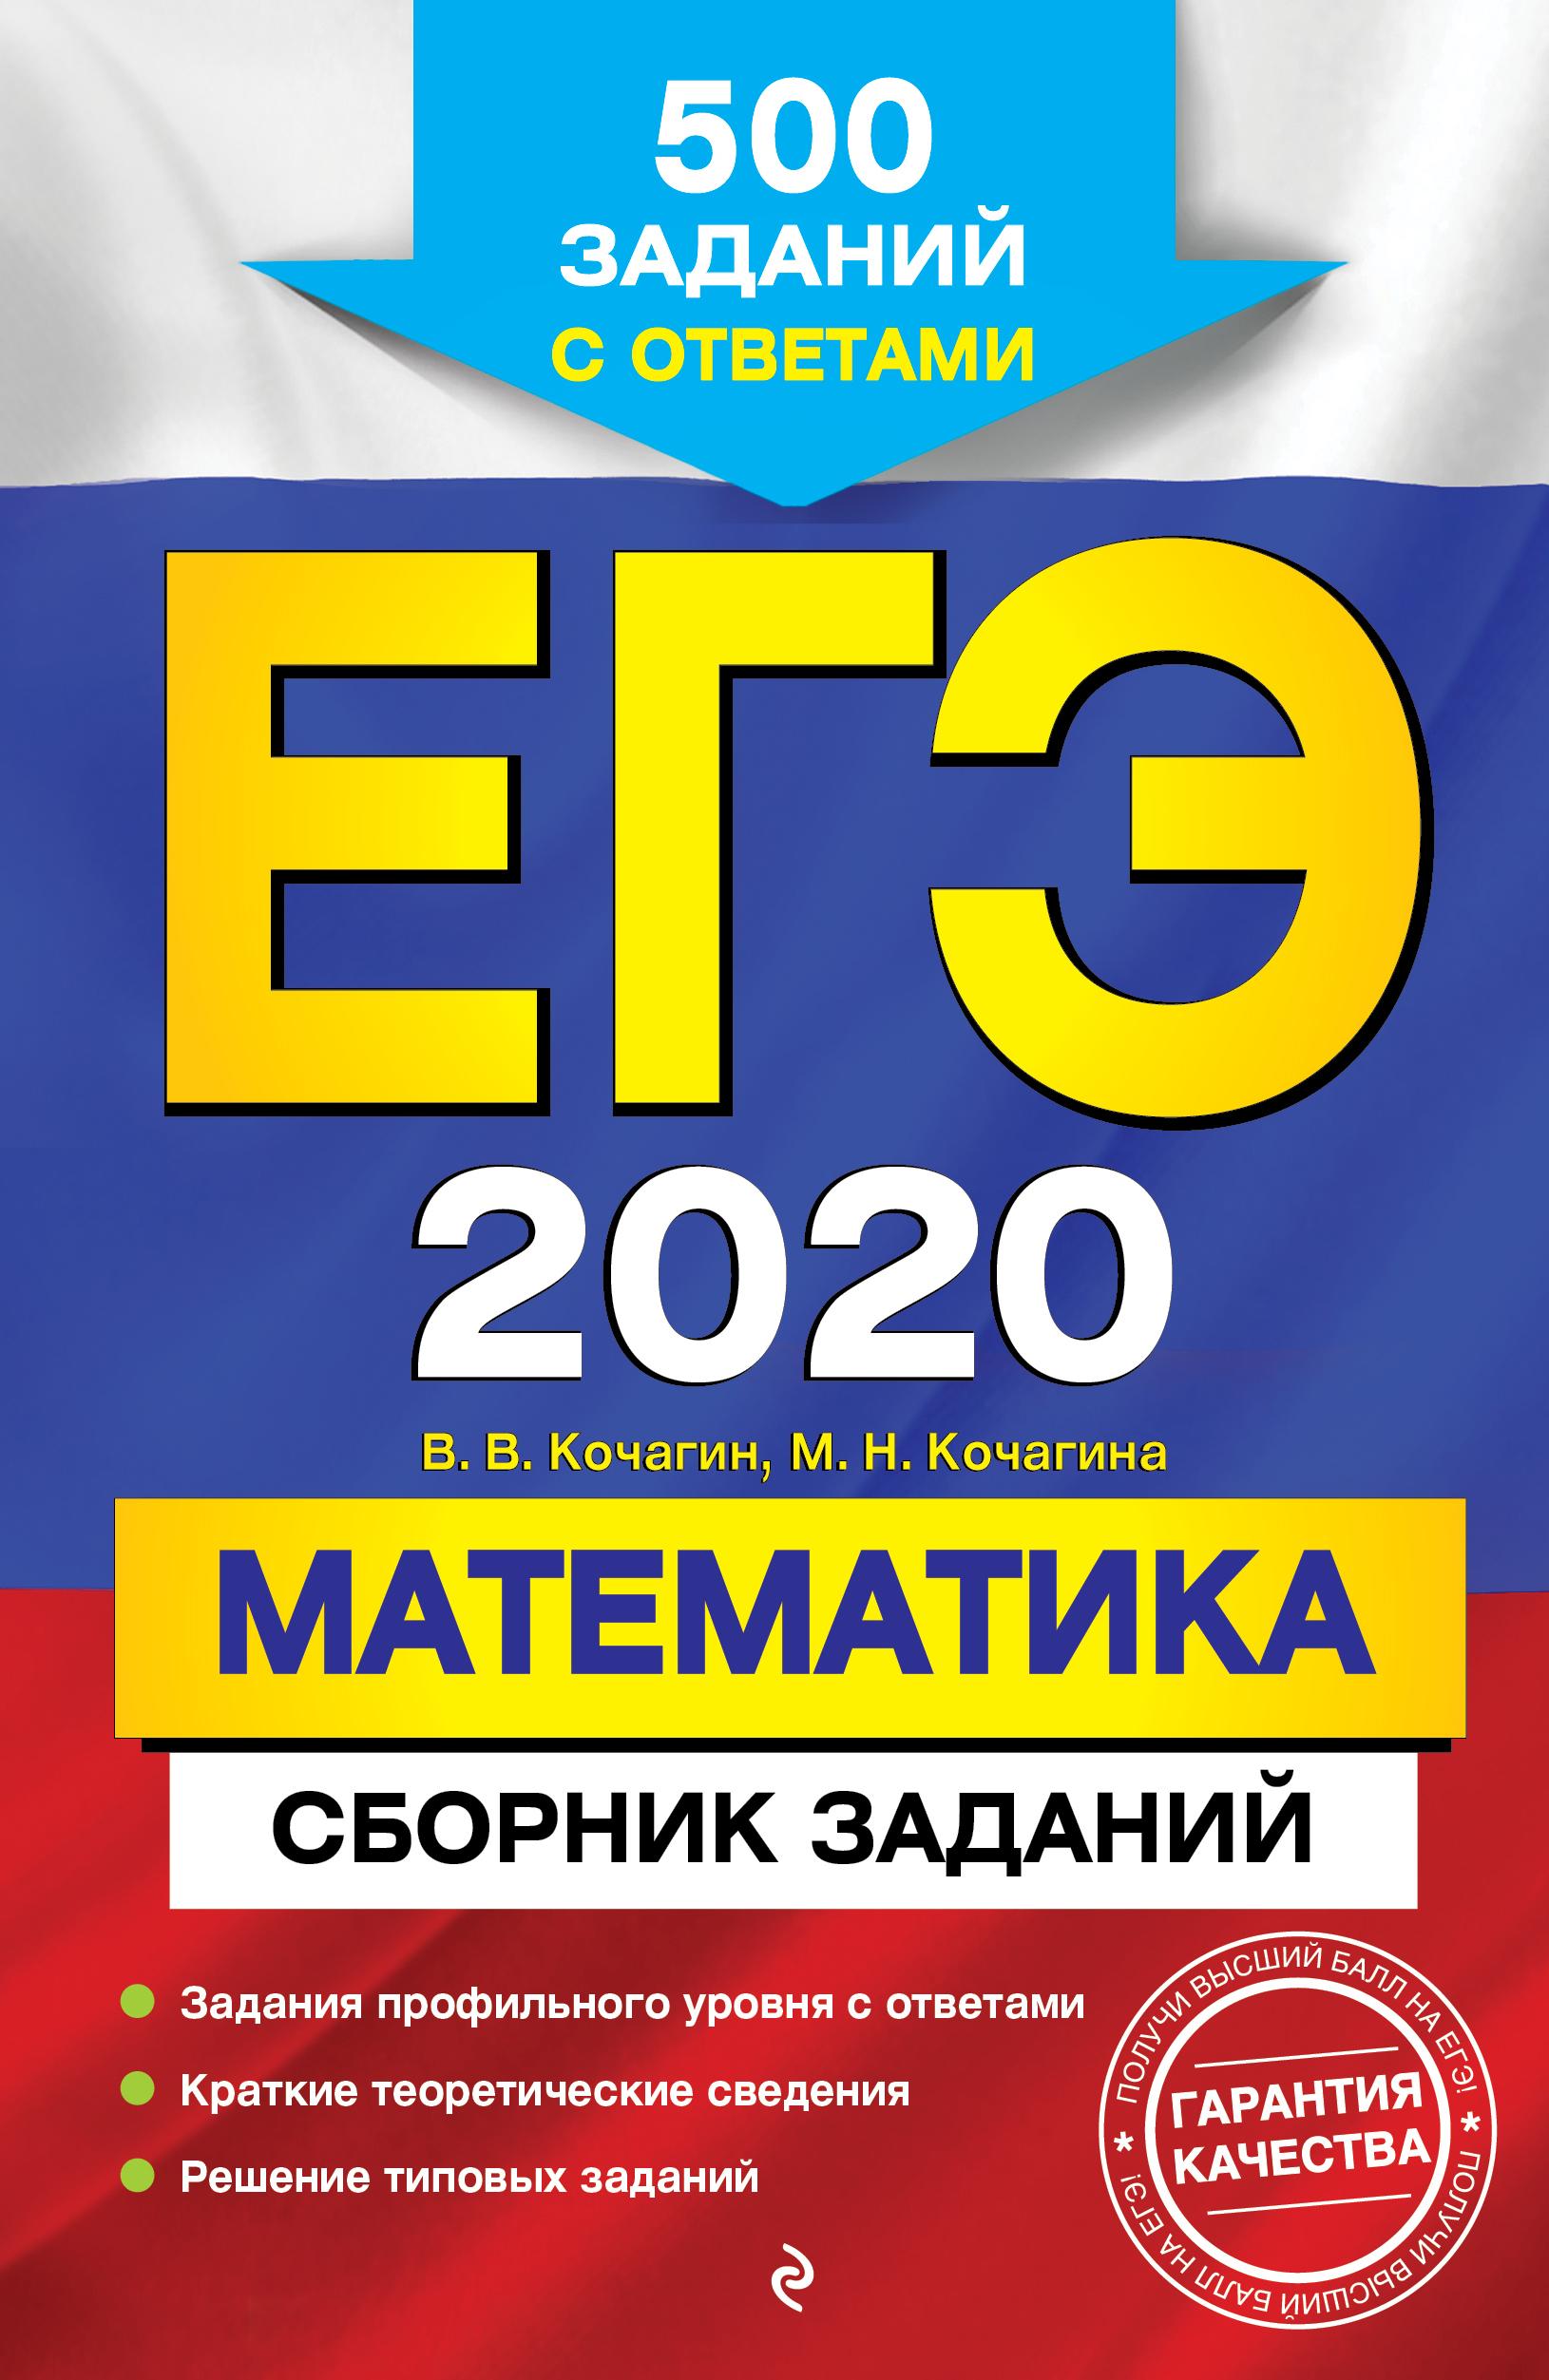 цена на В. В. Кочагин. М. Н. Кочагина ЕГЭ-2020. Математика. Сборник заданий